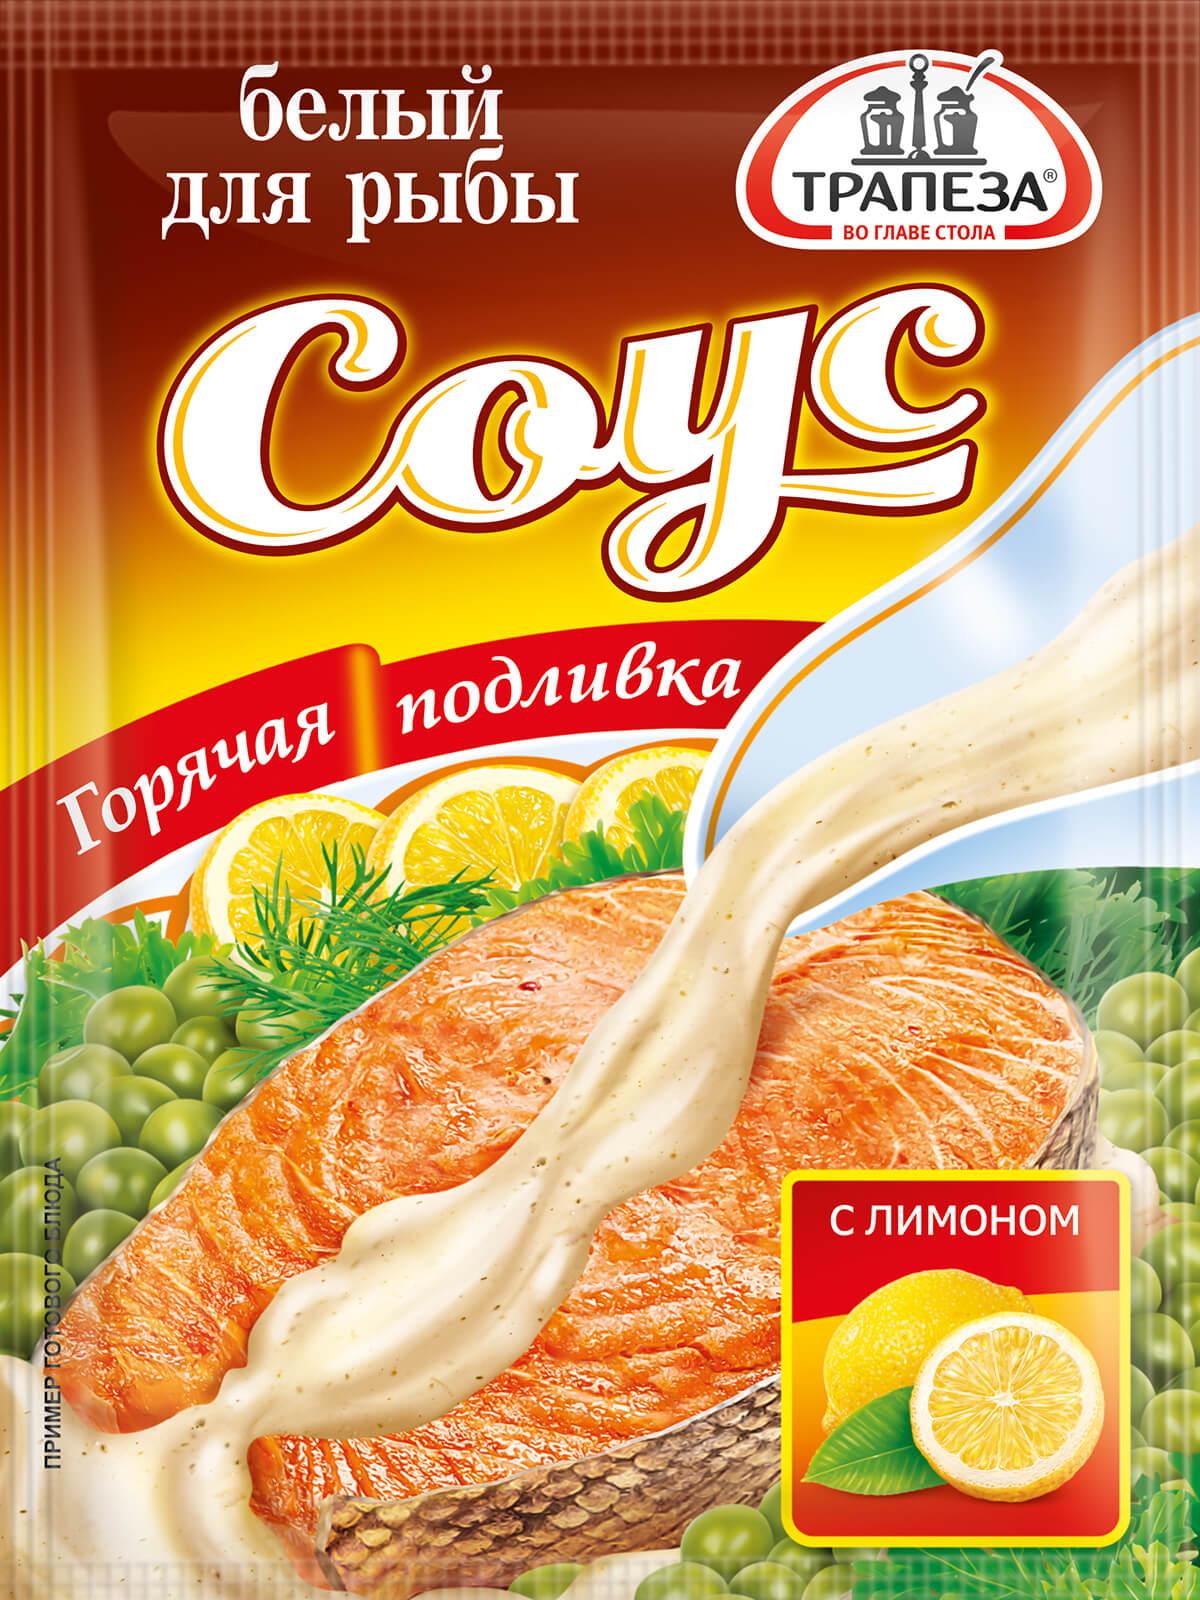 Соус белый для рыбы Трапеза 50г.